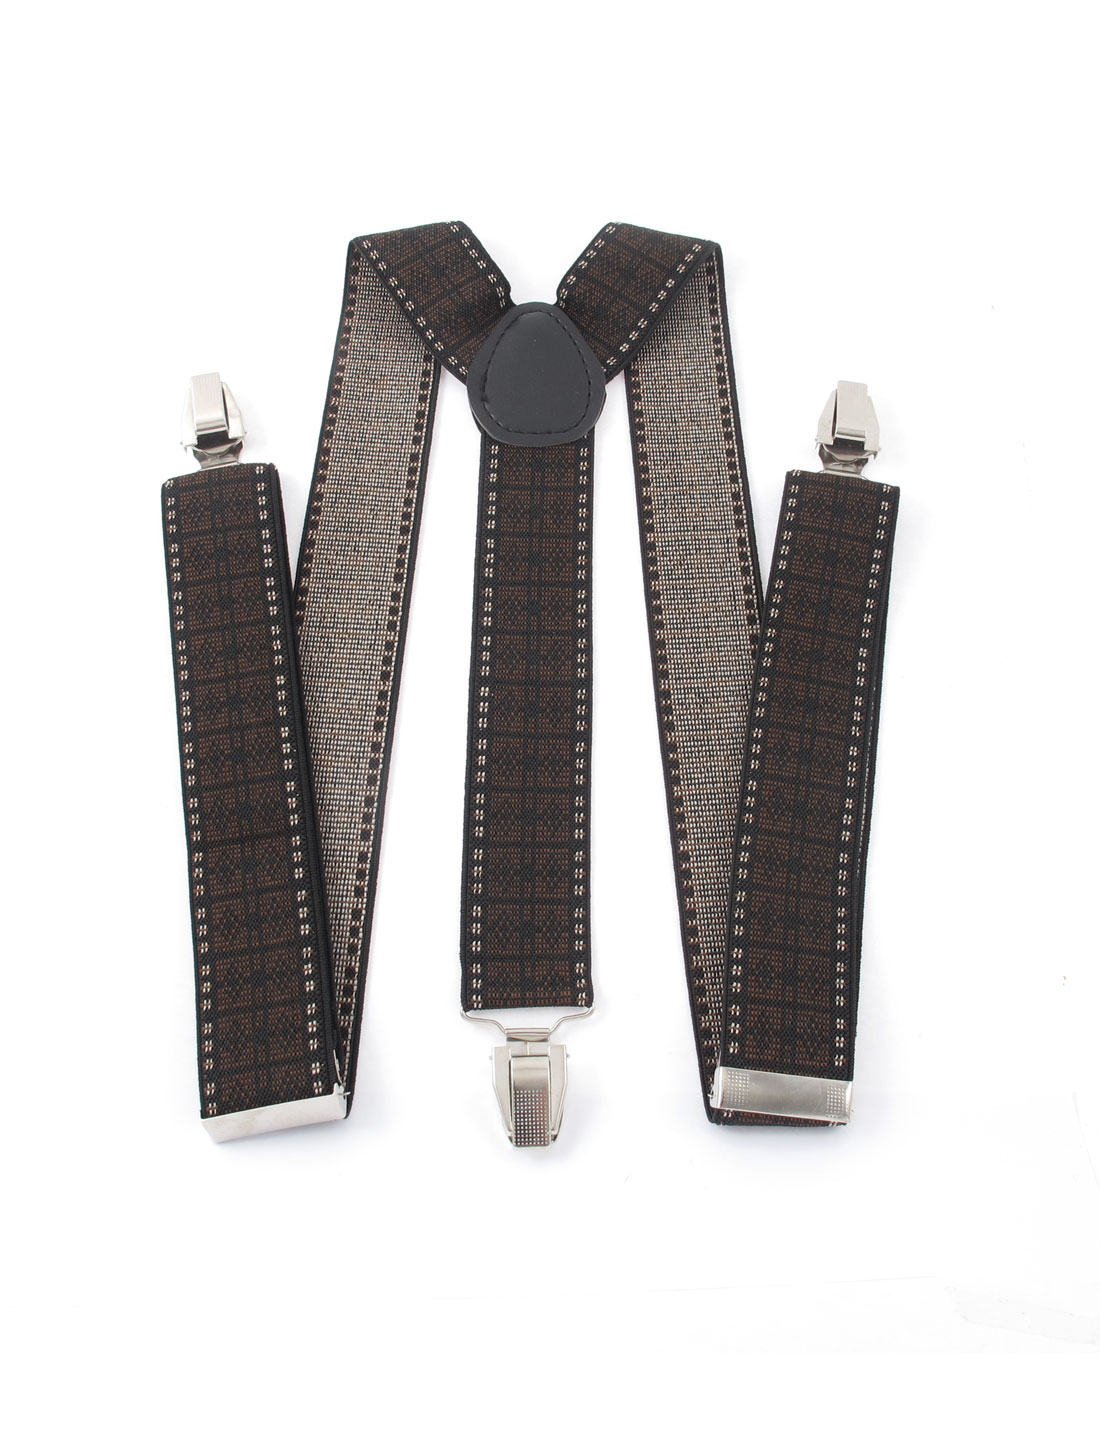 Adjustable Elastic Y-Shape 3 Clips Design Clip-on Suspender Braces Black Brown